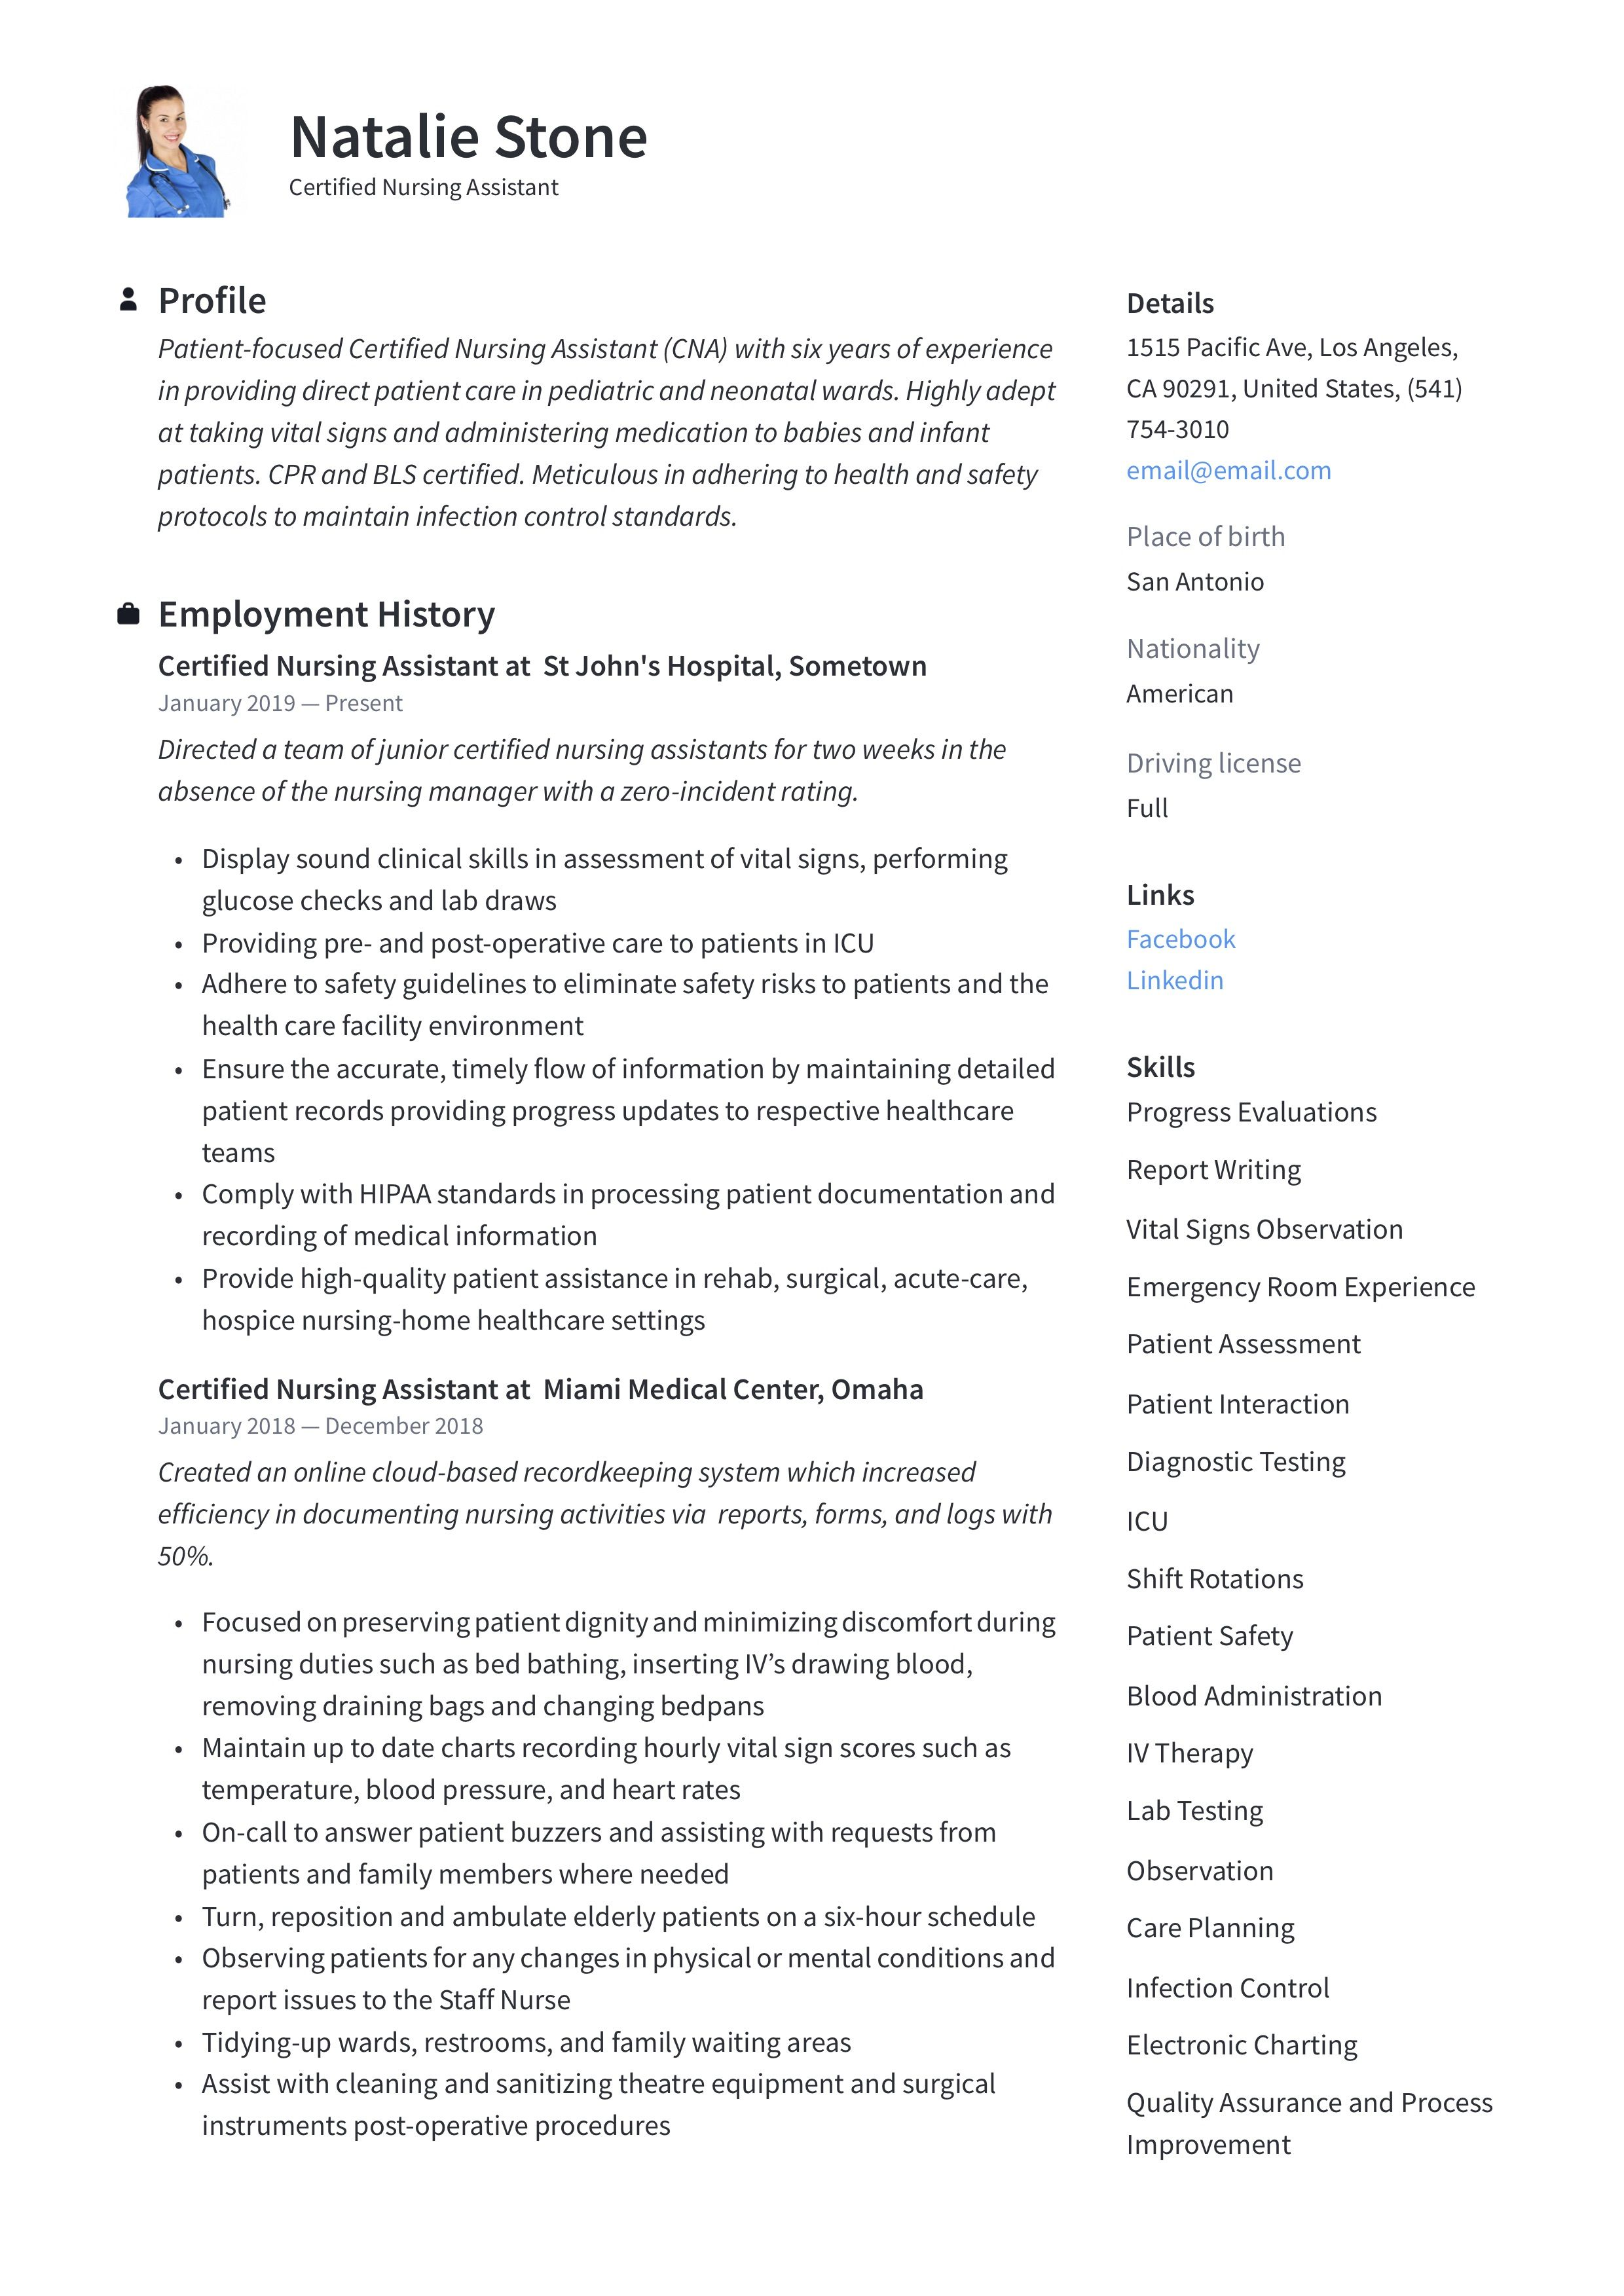 Certified Nursing Assistant Resume Template in 2020